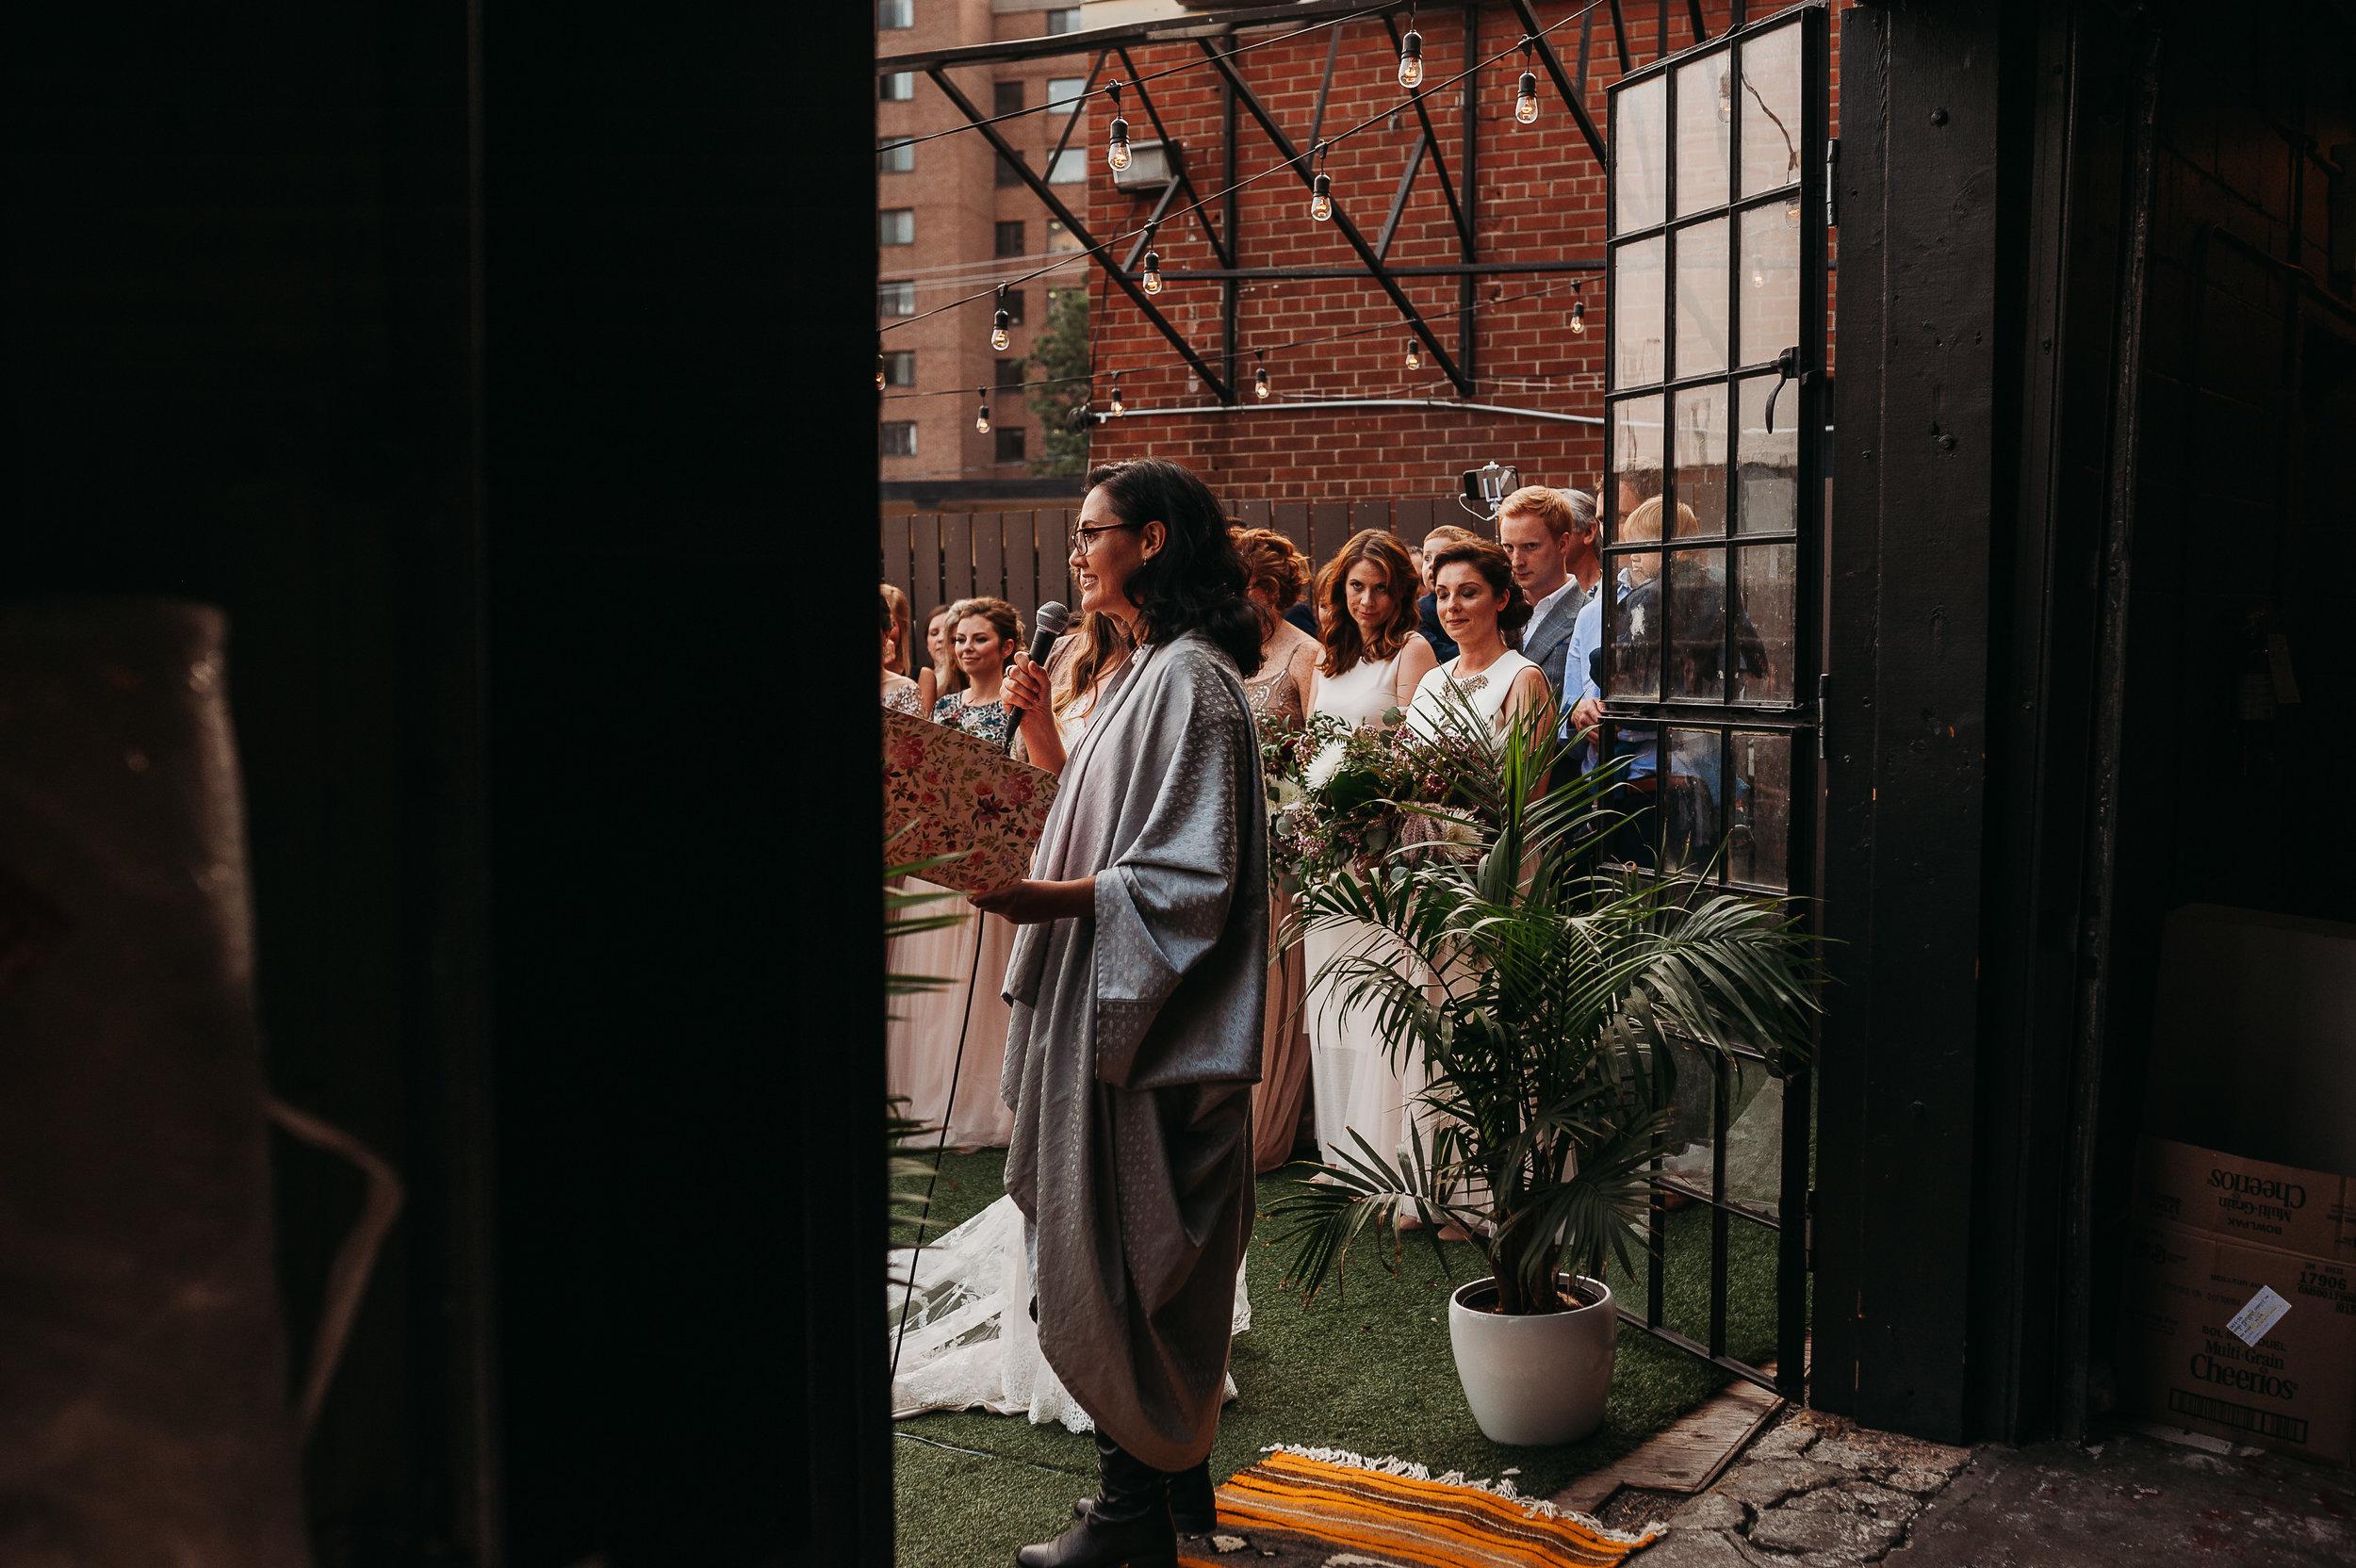 wedding-ceremony-officient-toronto-rustic-boho-airship37-wedding-by-willow-birch-photo-toronto-documentary-wedding-photographers.jpg